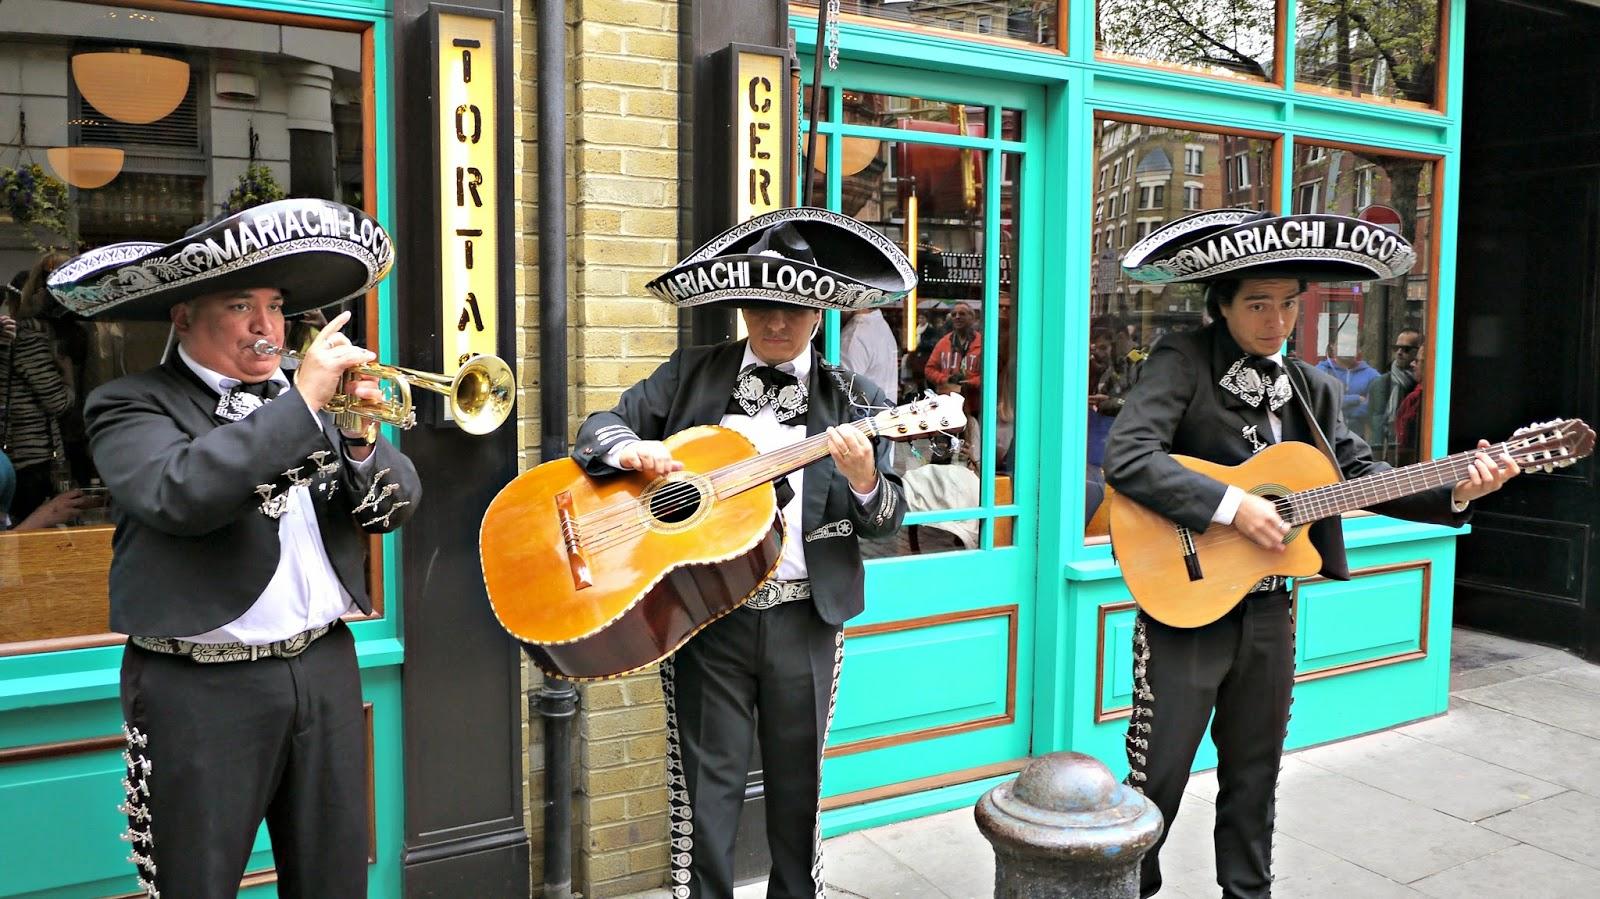 La Bodega Negra Soho Mariachi Band